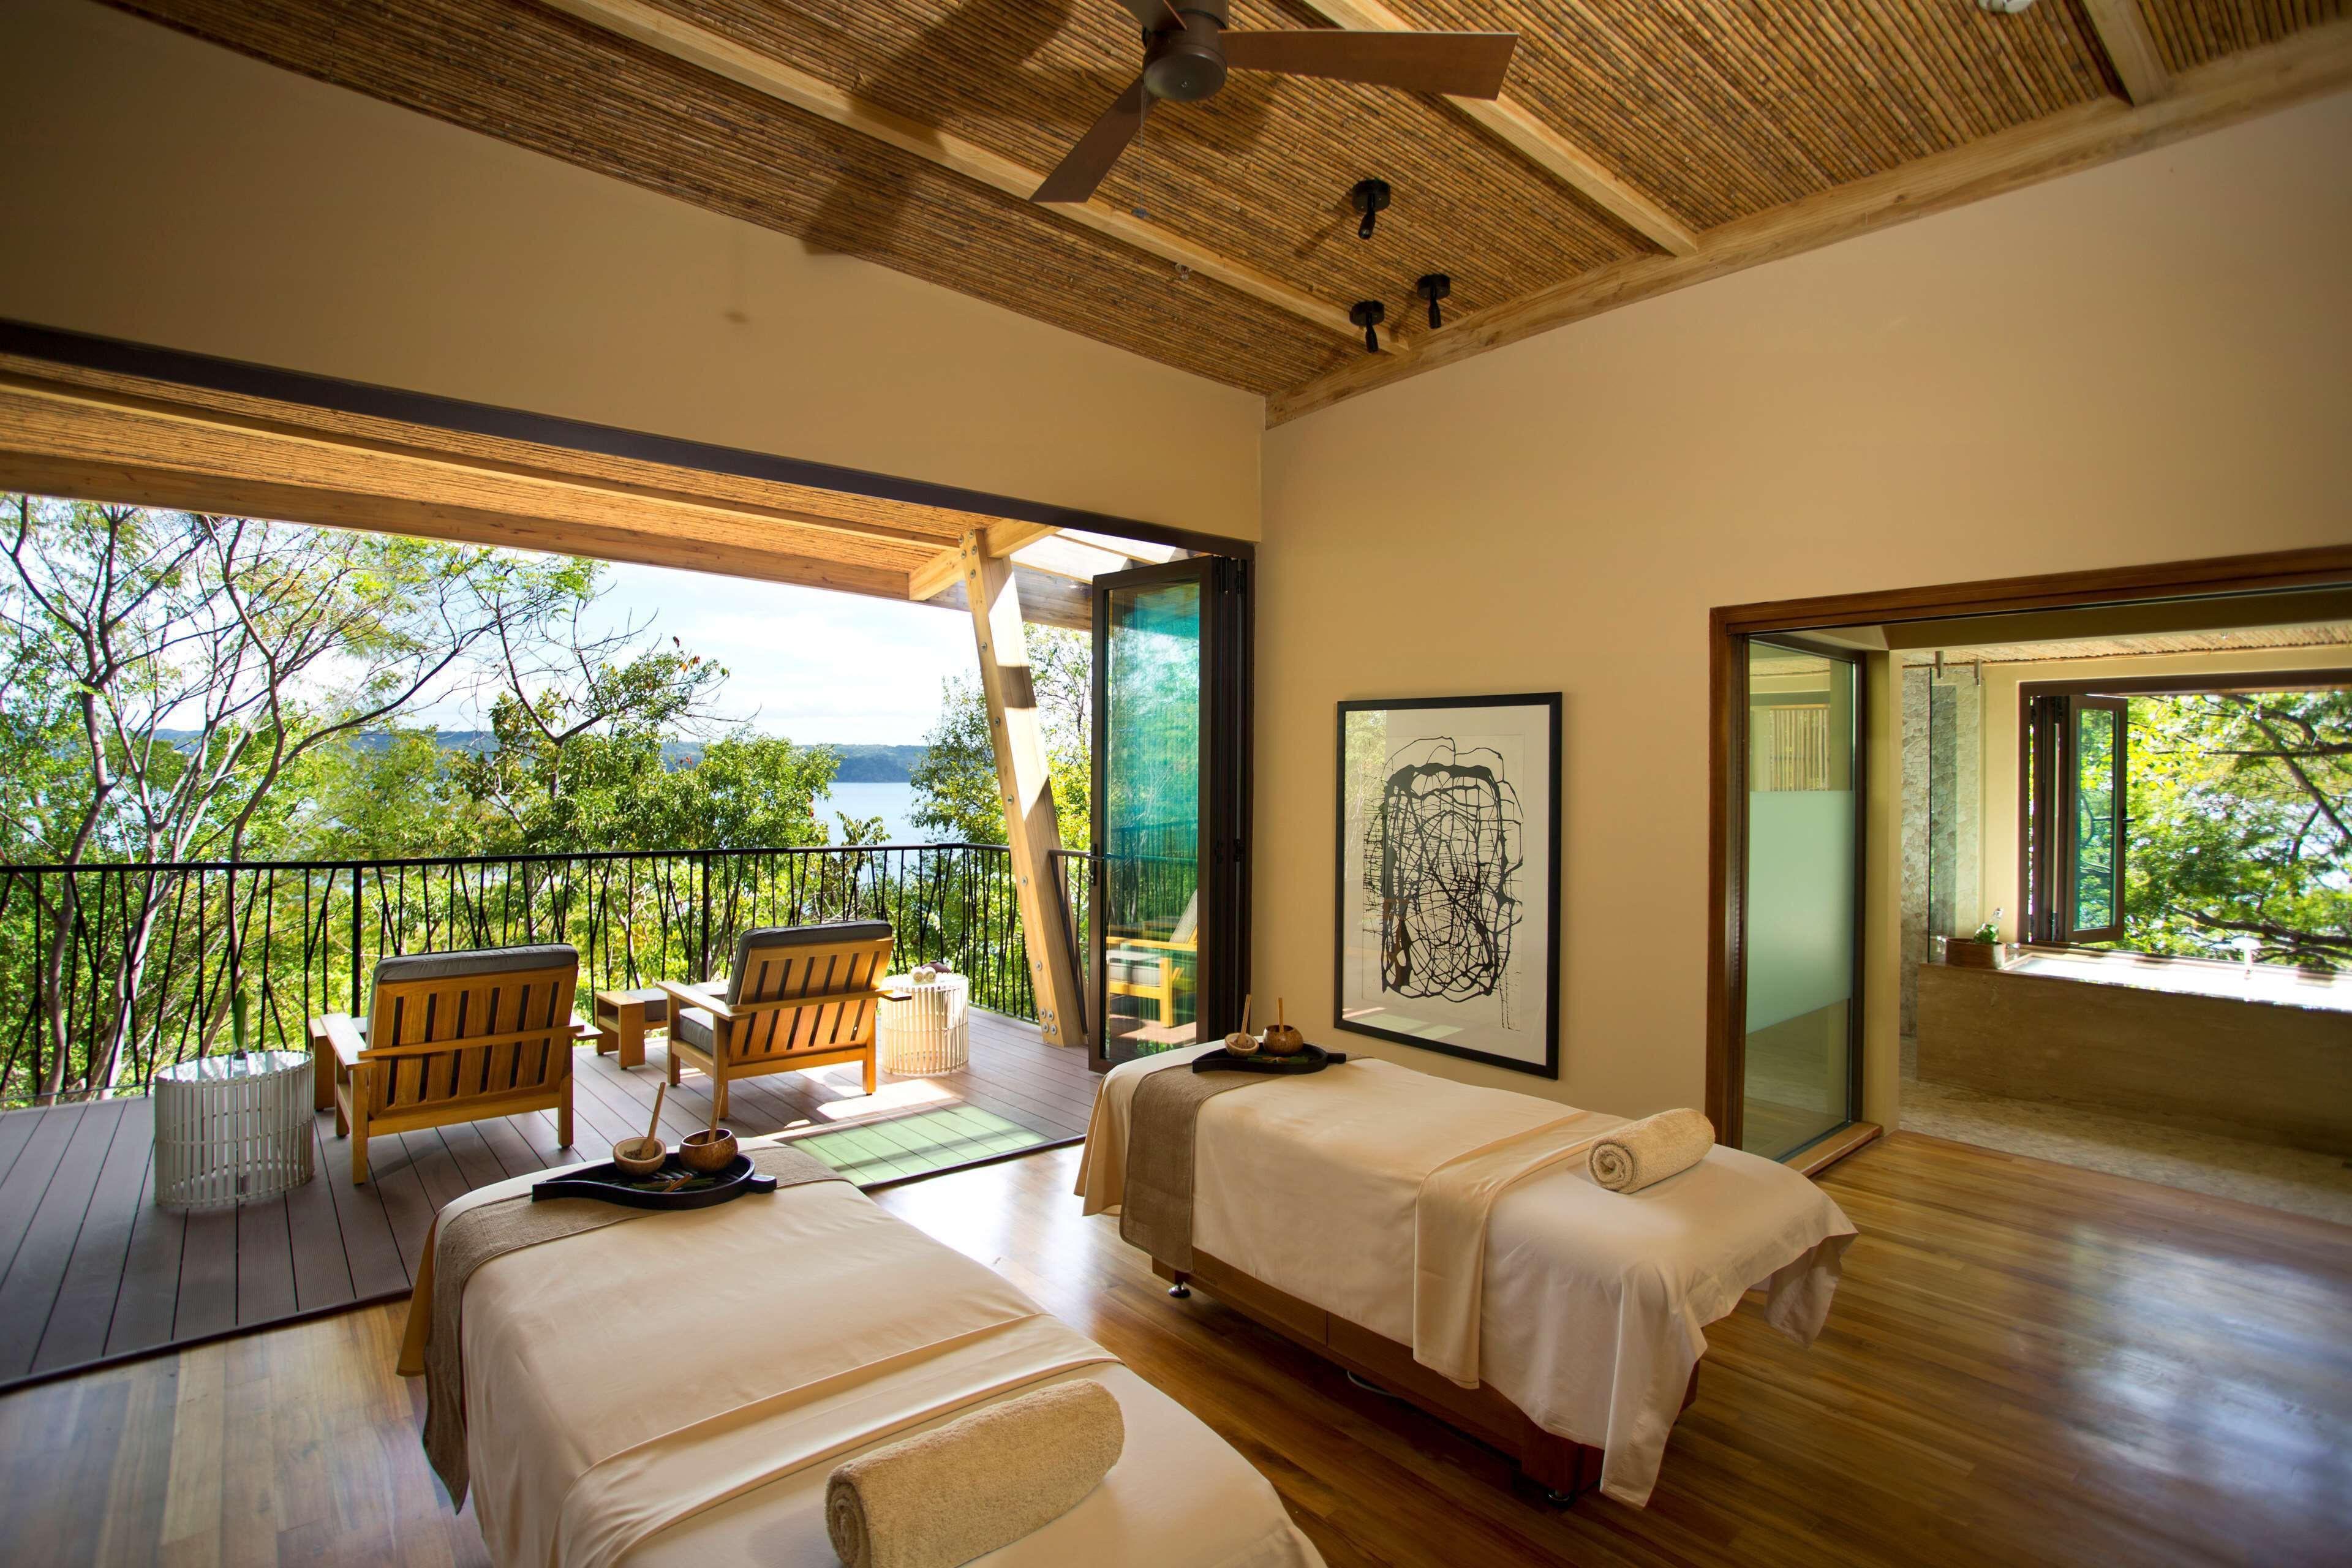 Courtesy of Andaz Costa Rica Resort at Peninsula Papagayo / Expedia